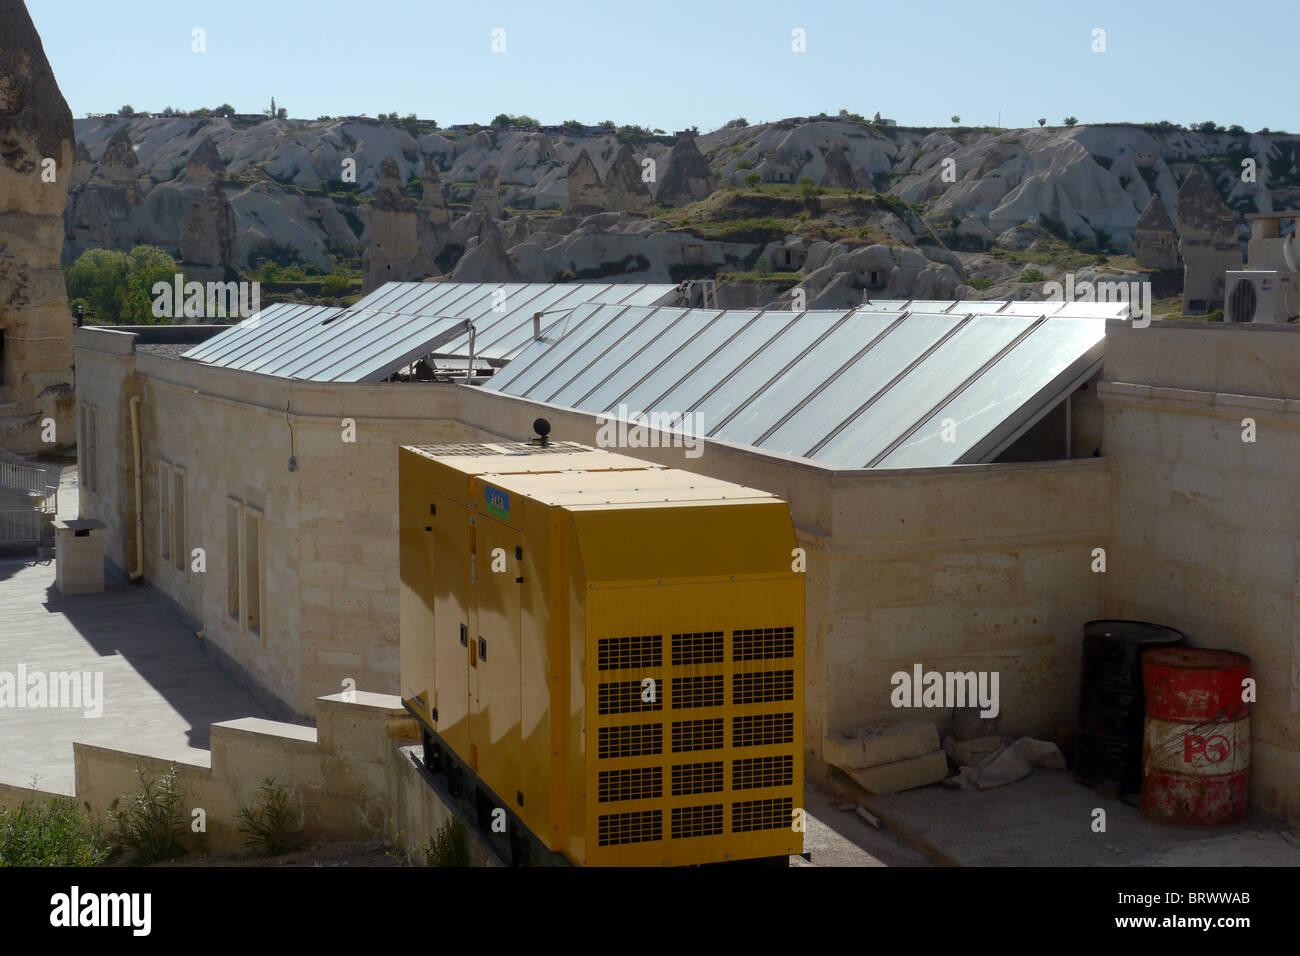 TURKEY Solar water heating panels on a hotel, Goreme, Cappadocia. photo by Sean Sprague - Stock Image